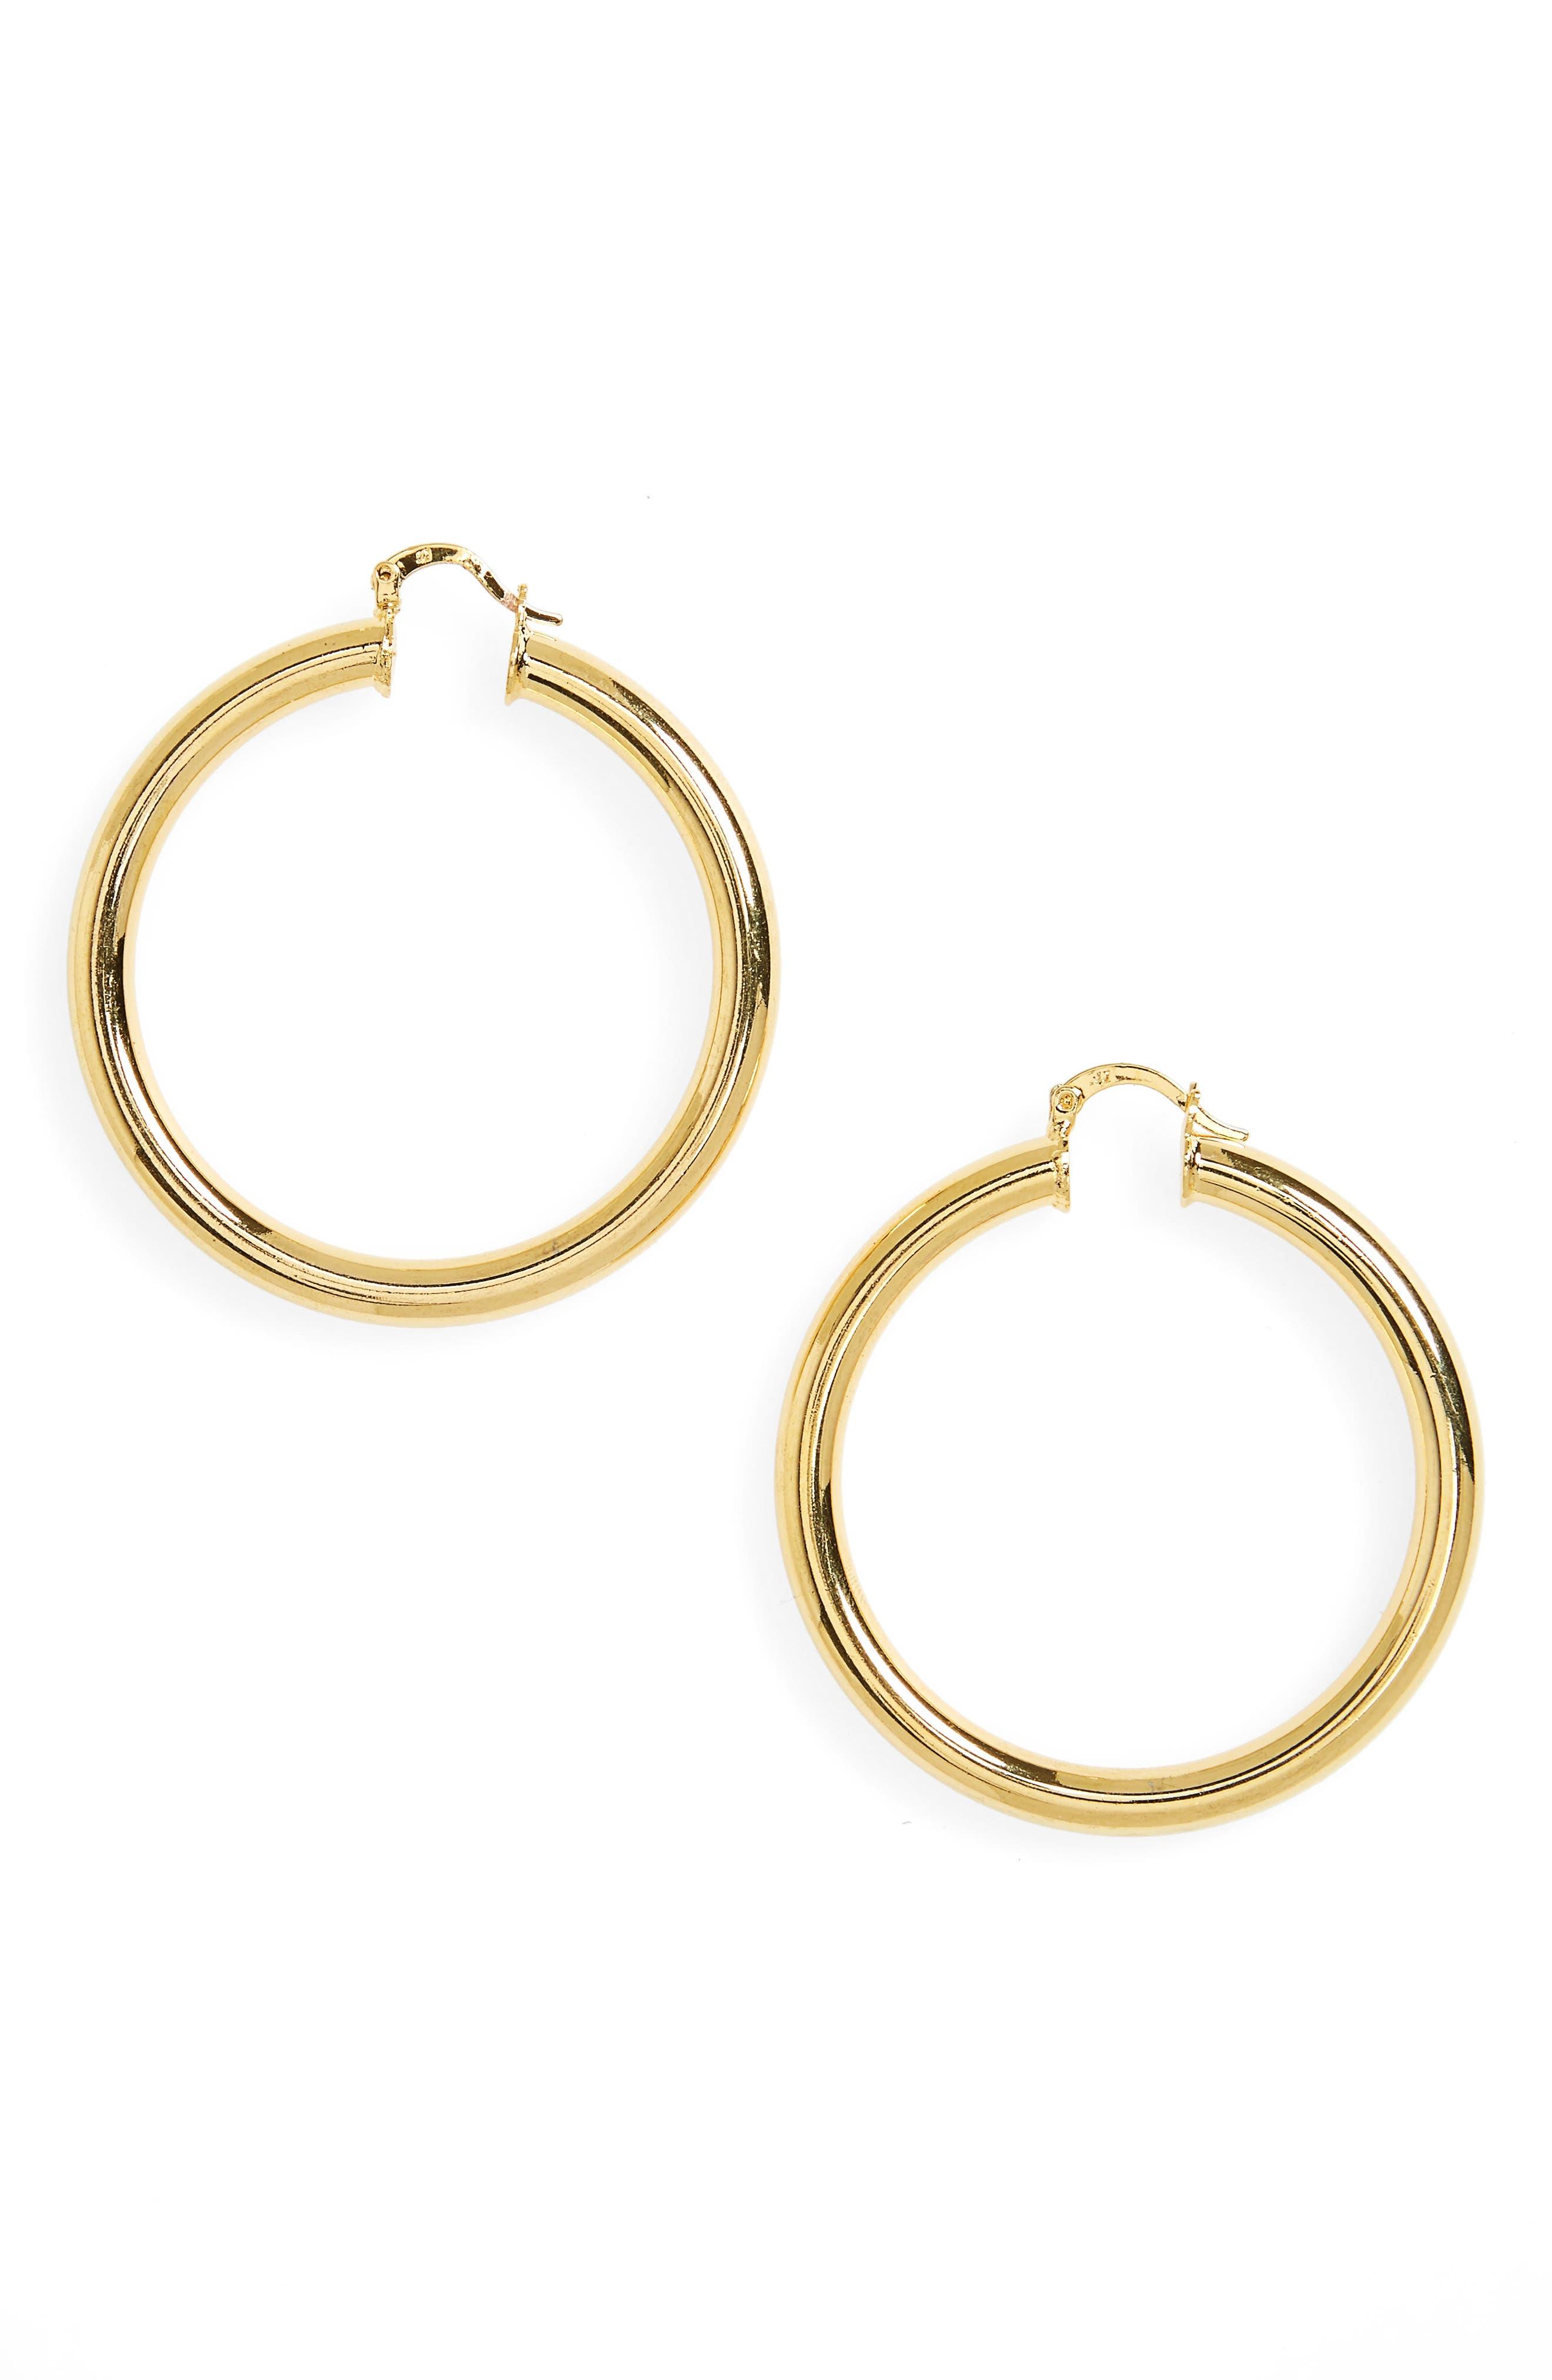 Alternate Image 1 Selected - Melody Ehsani Sade Medium Hoop Earrings